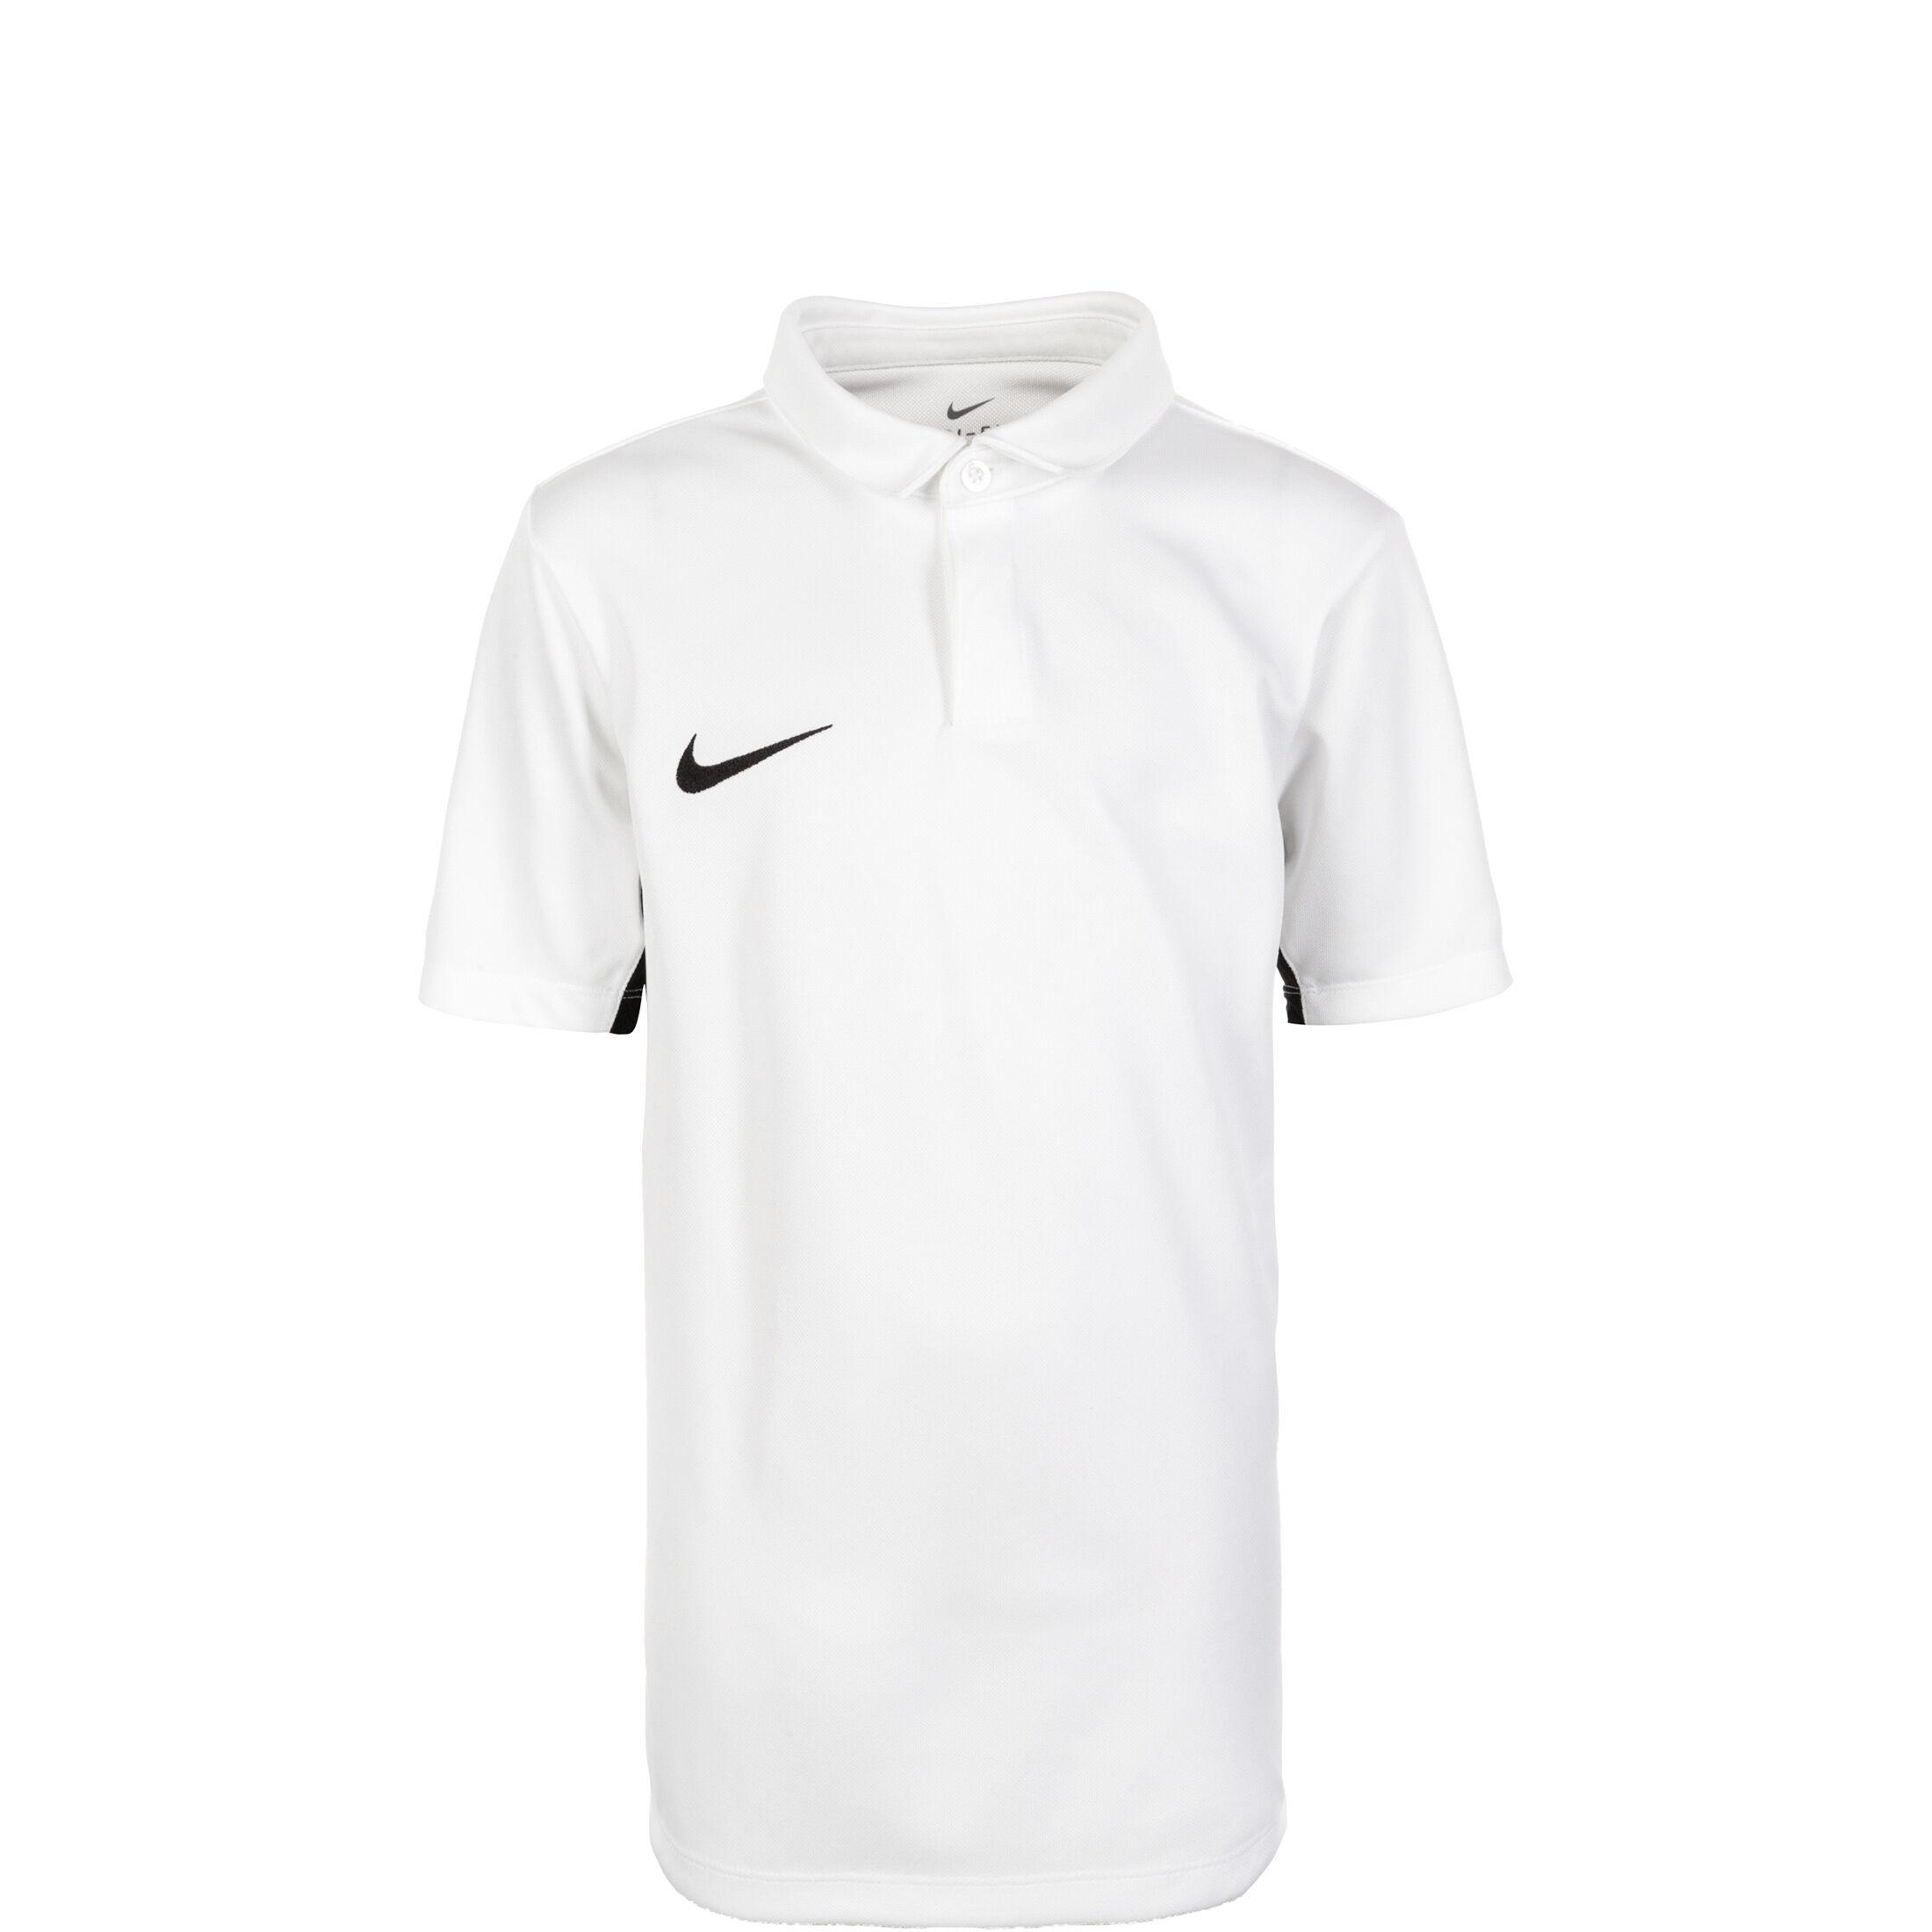 Nike Performance Dry Academy 18 Poloshirt Kinder weiß bei